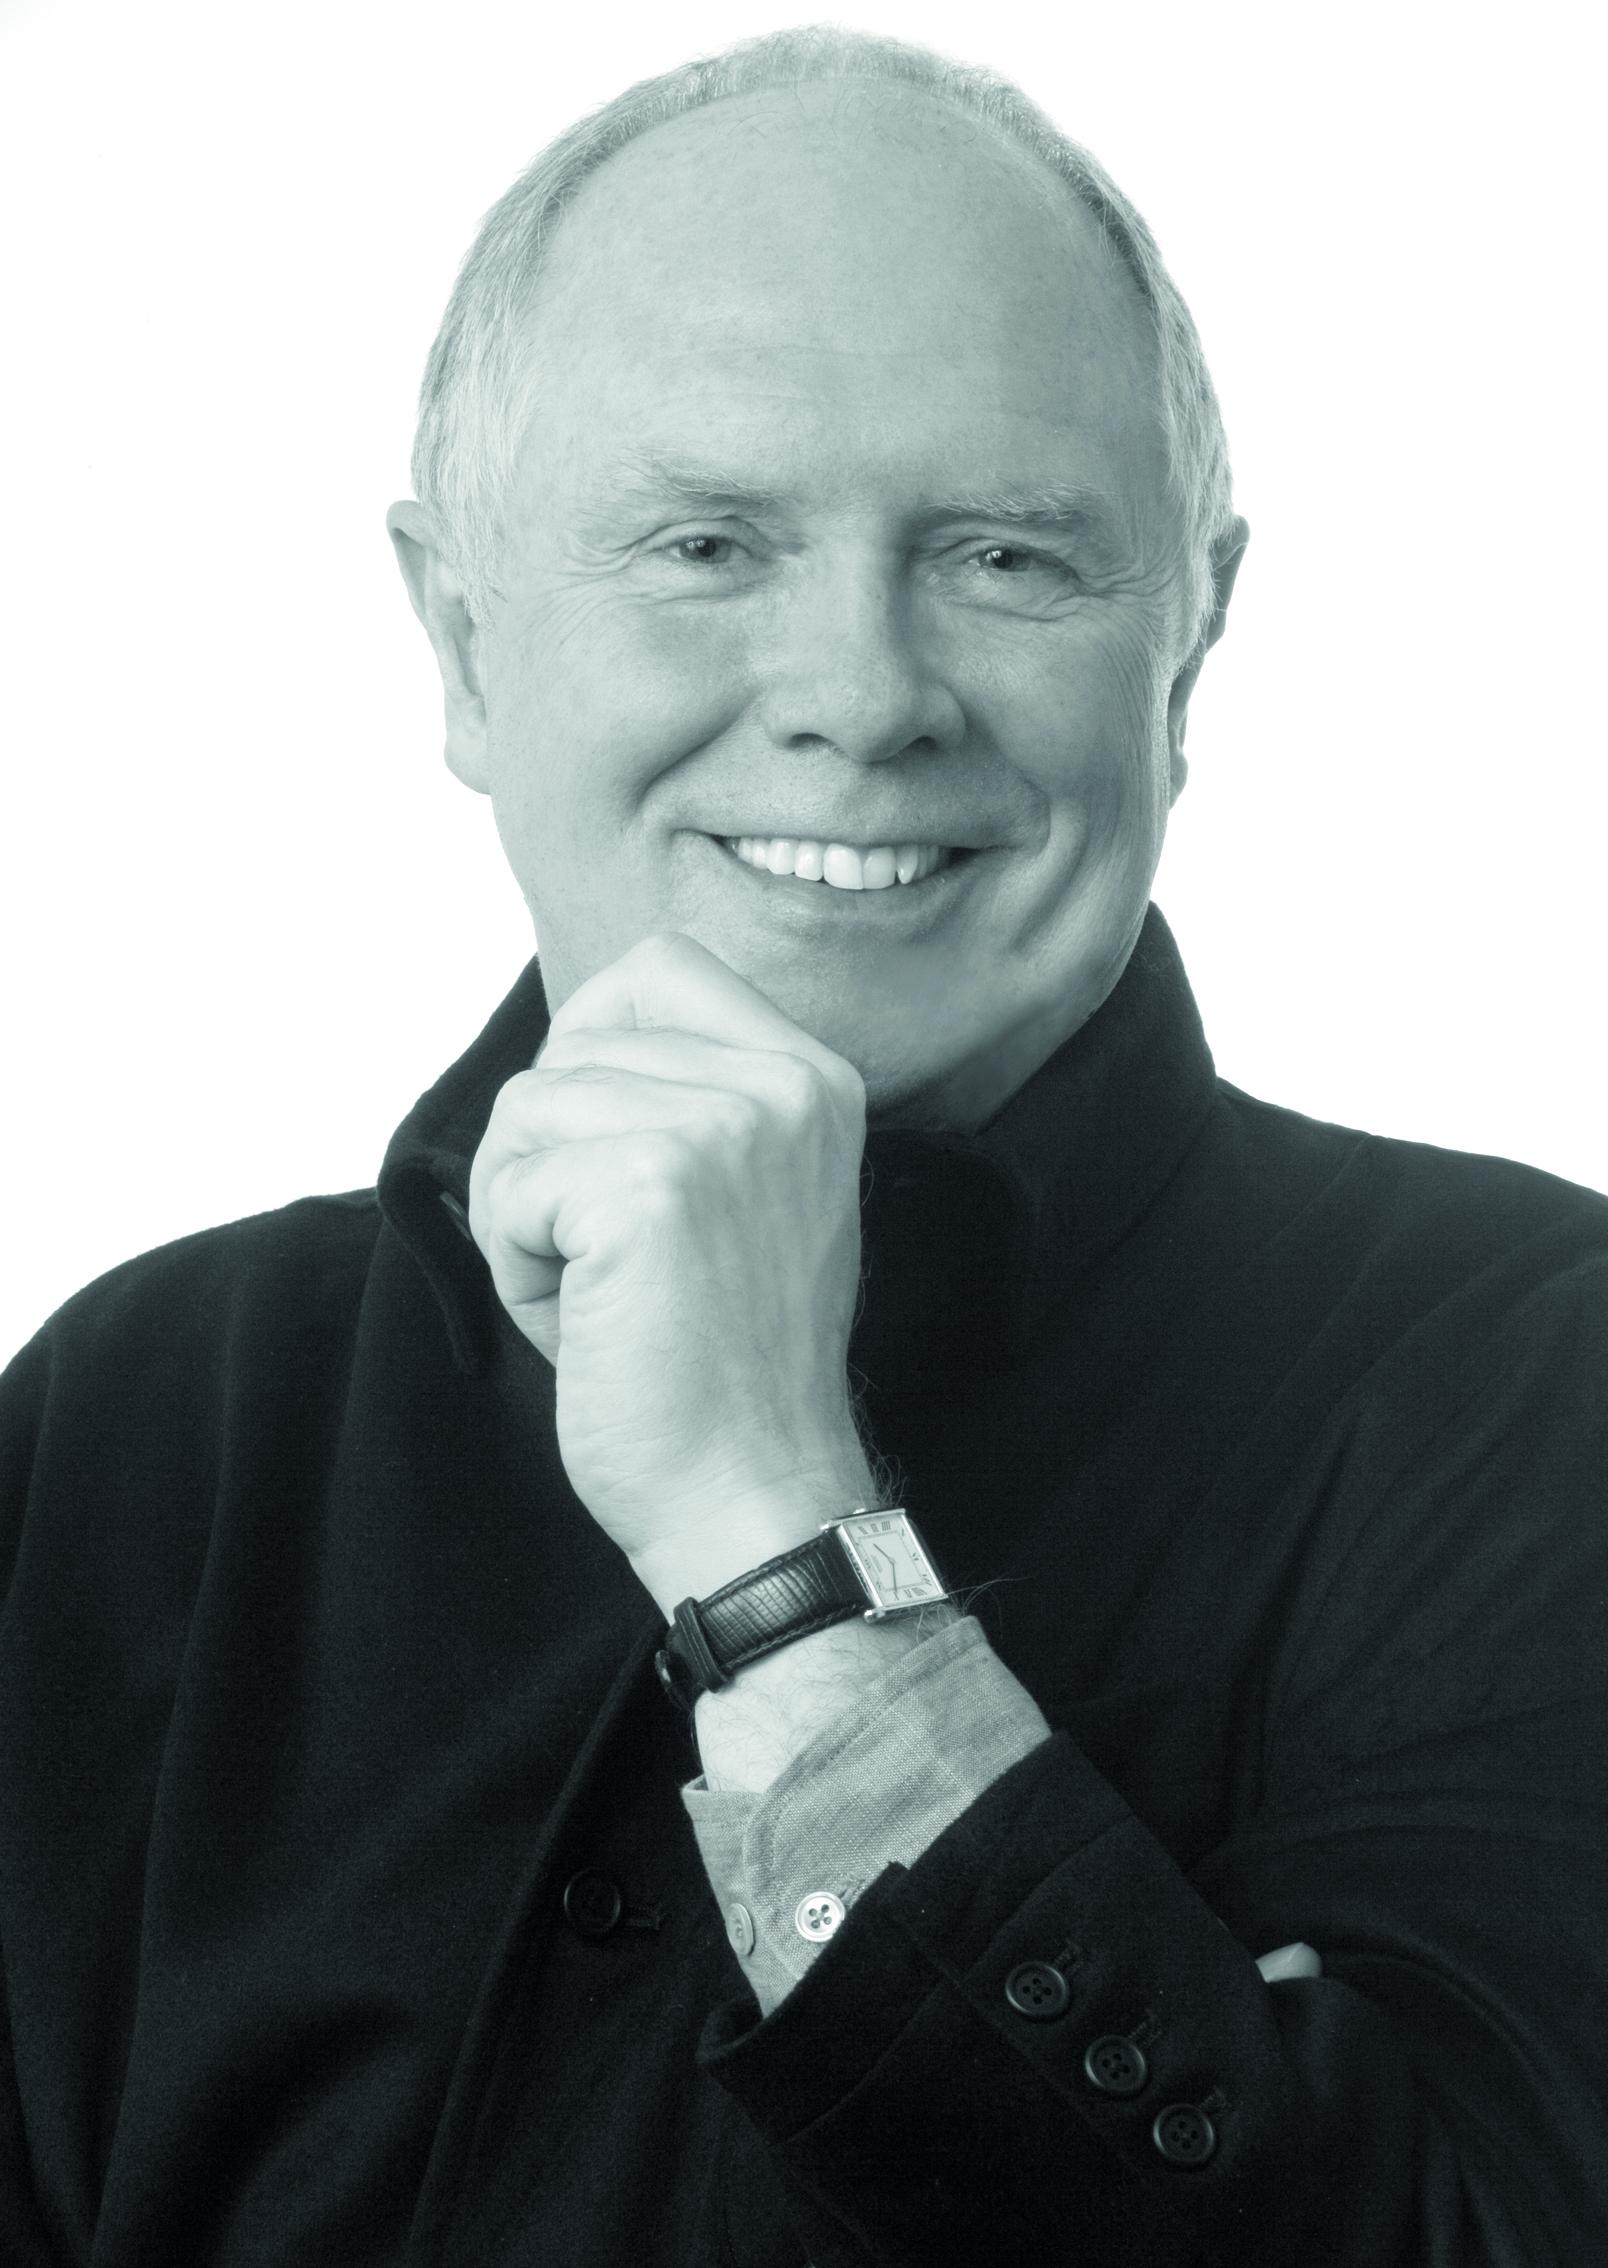 Stephen Lord - artist at English National Opera